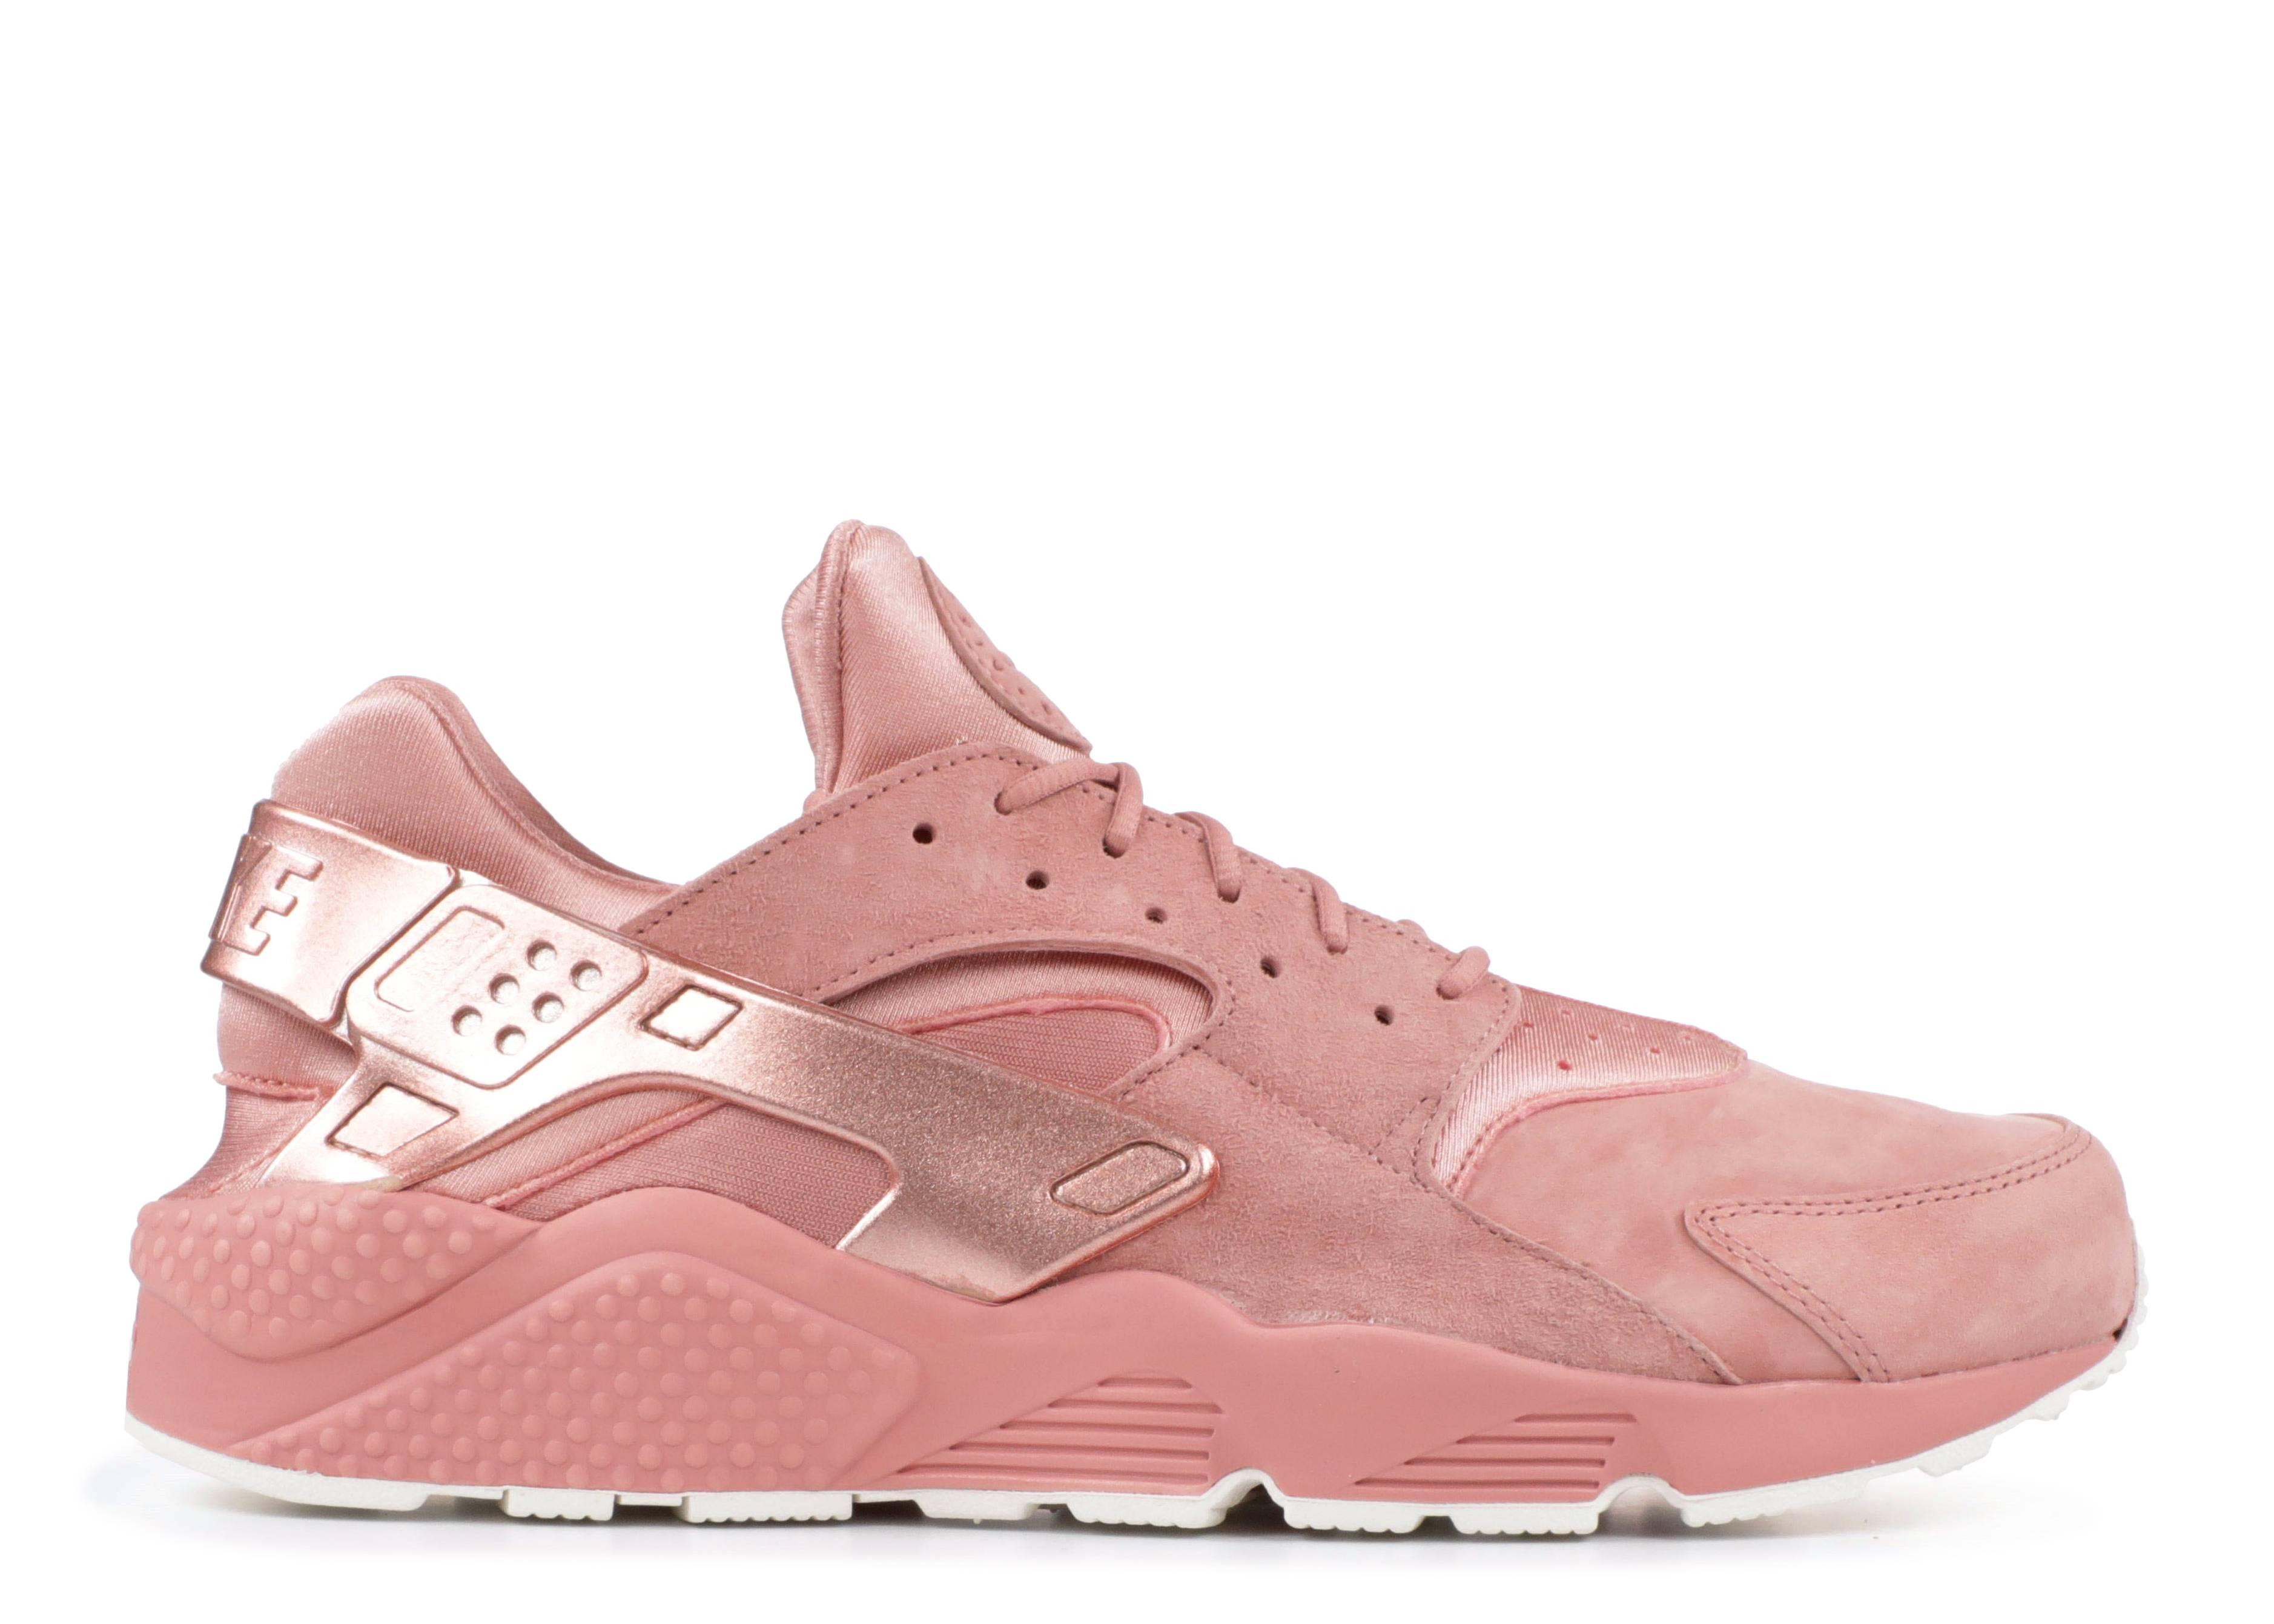 63d0af8c9ded Nike Air Huarache Run Prm - Nike - 704830 601 - rust pink mtlc red ...